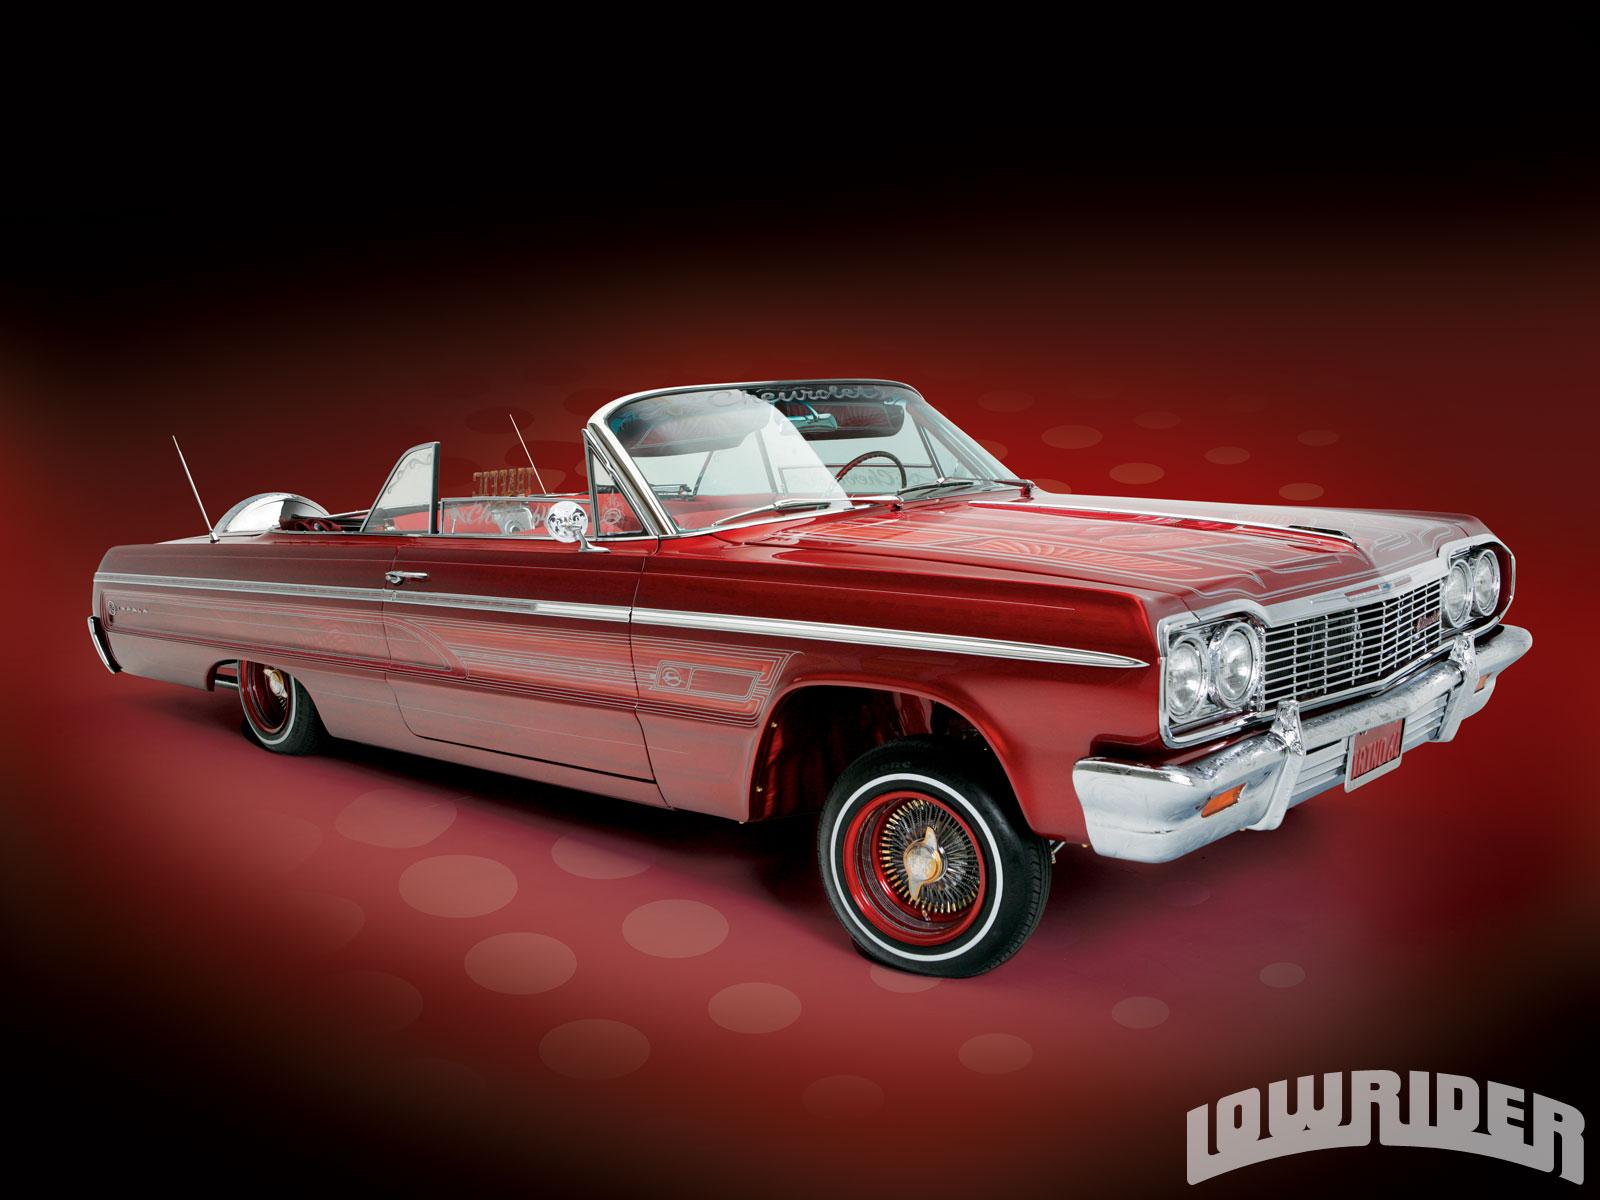 1964 chevrolet impala ss lowrider magazine. Black Bedroom Furniture Sets. Home Design Ideas